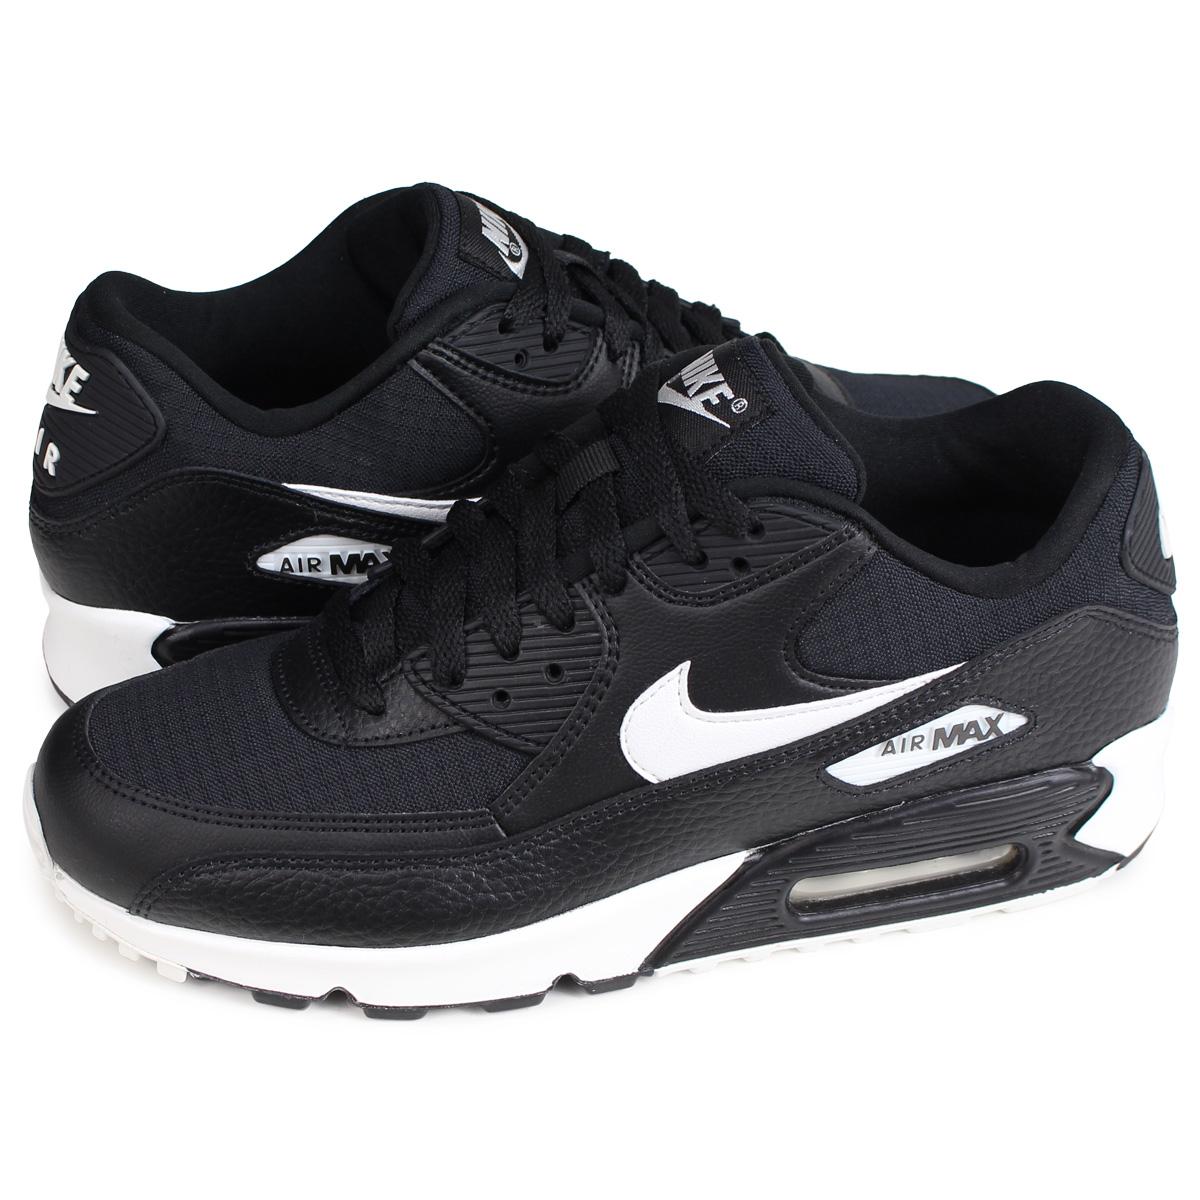 Nike Air Max 90 Black White Mens Running Shoes 325213 060